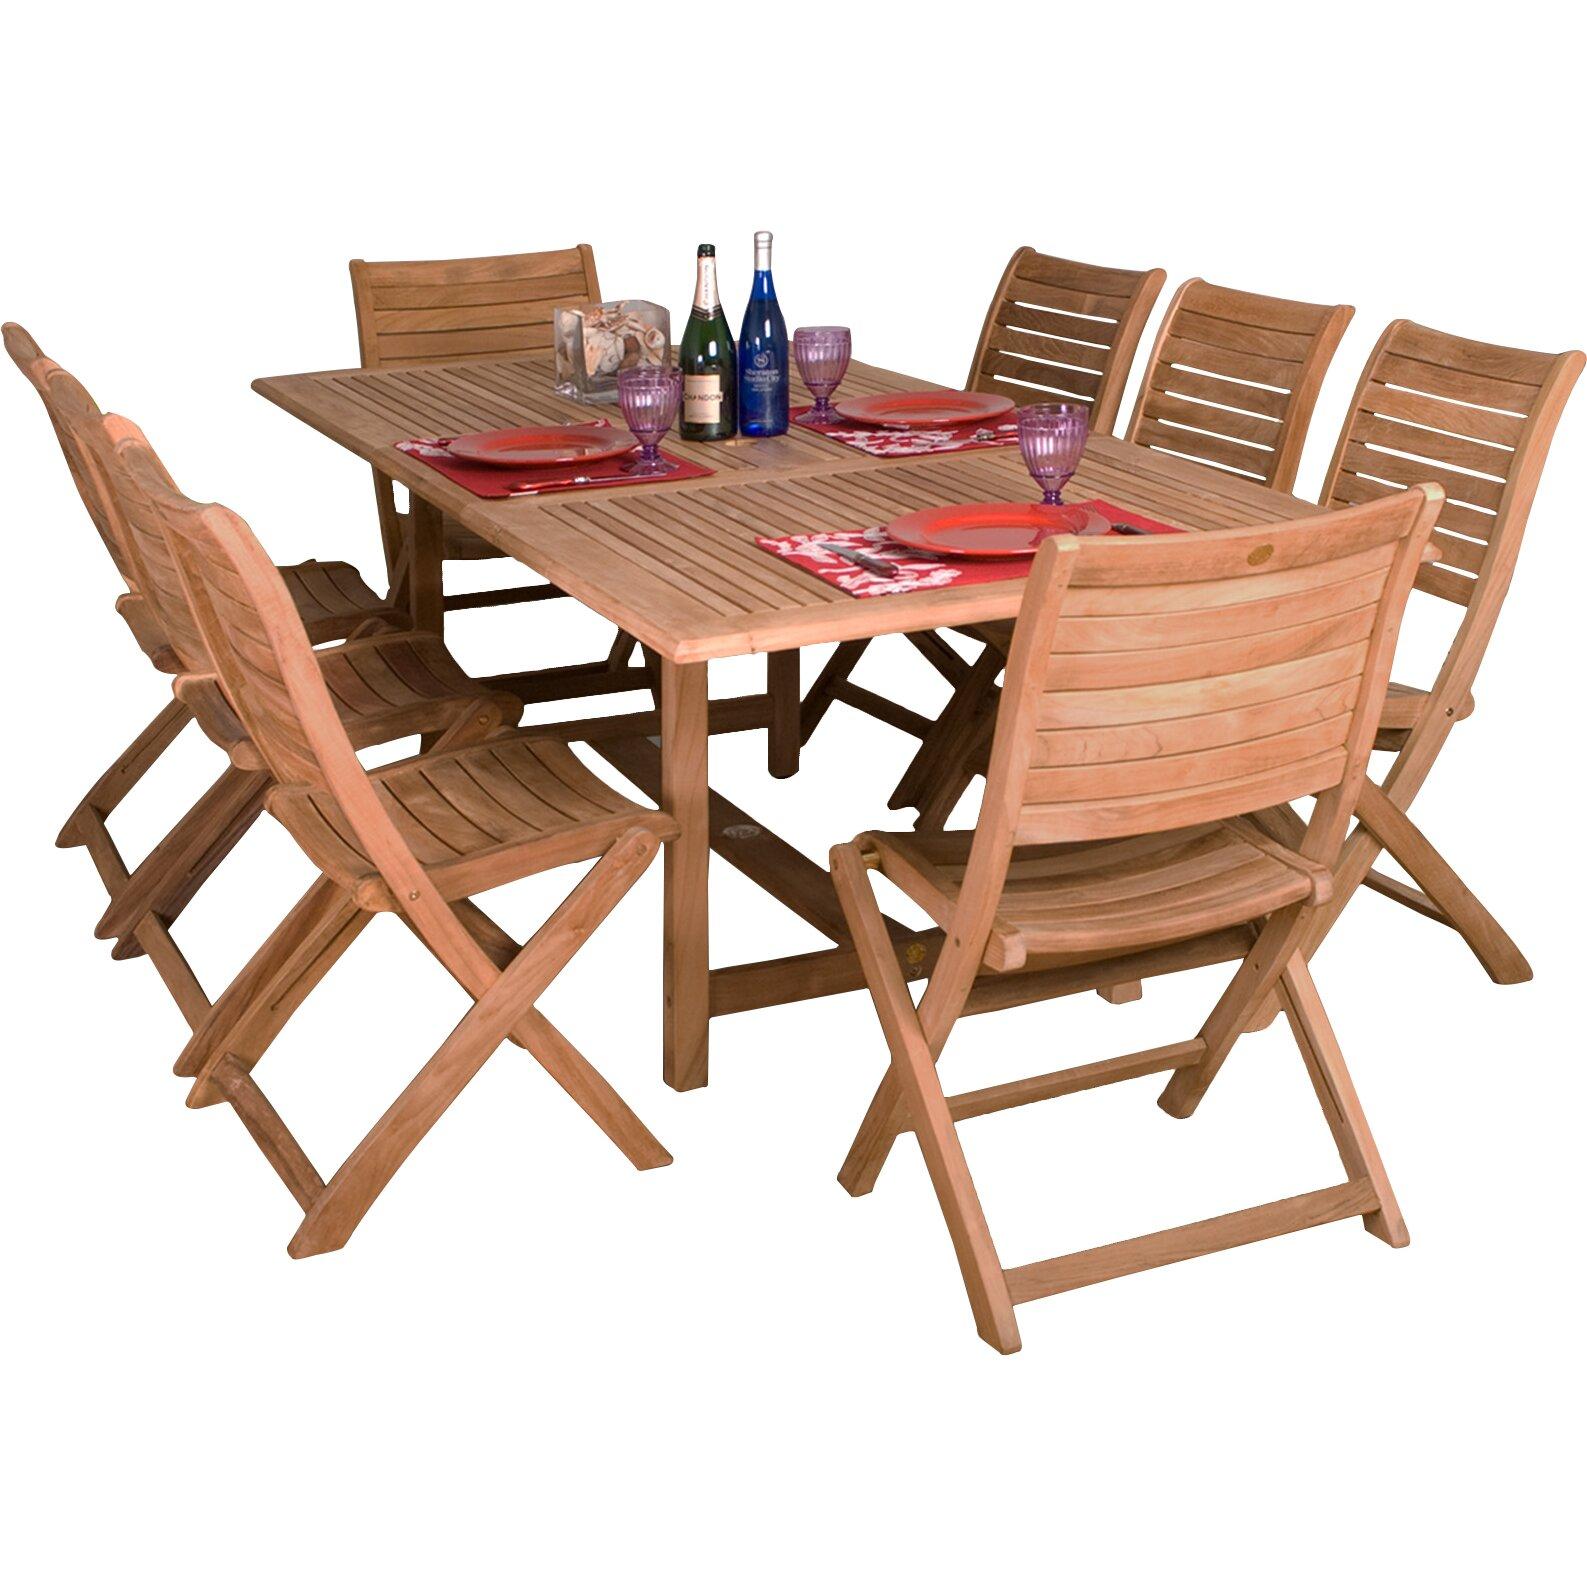 Teak Dining Room Set: International Home Miami Amazonia Teak 9 Piece Dining Set